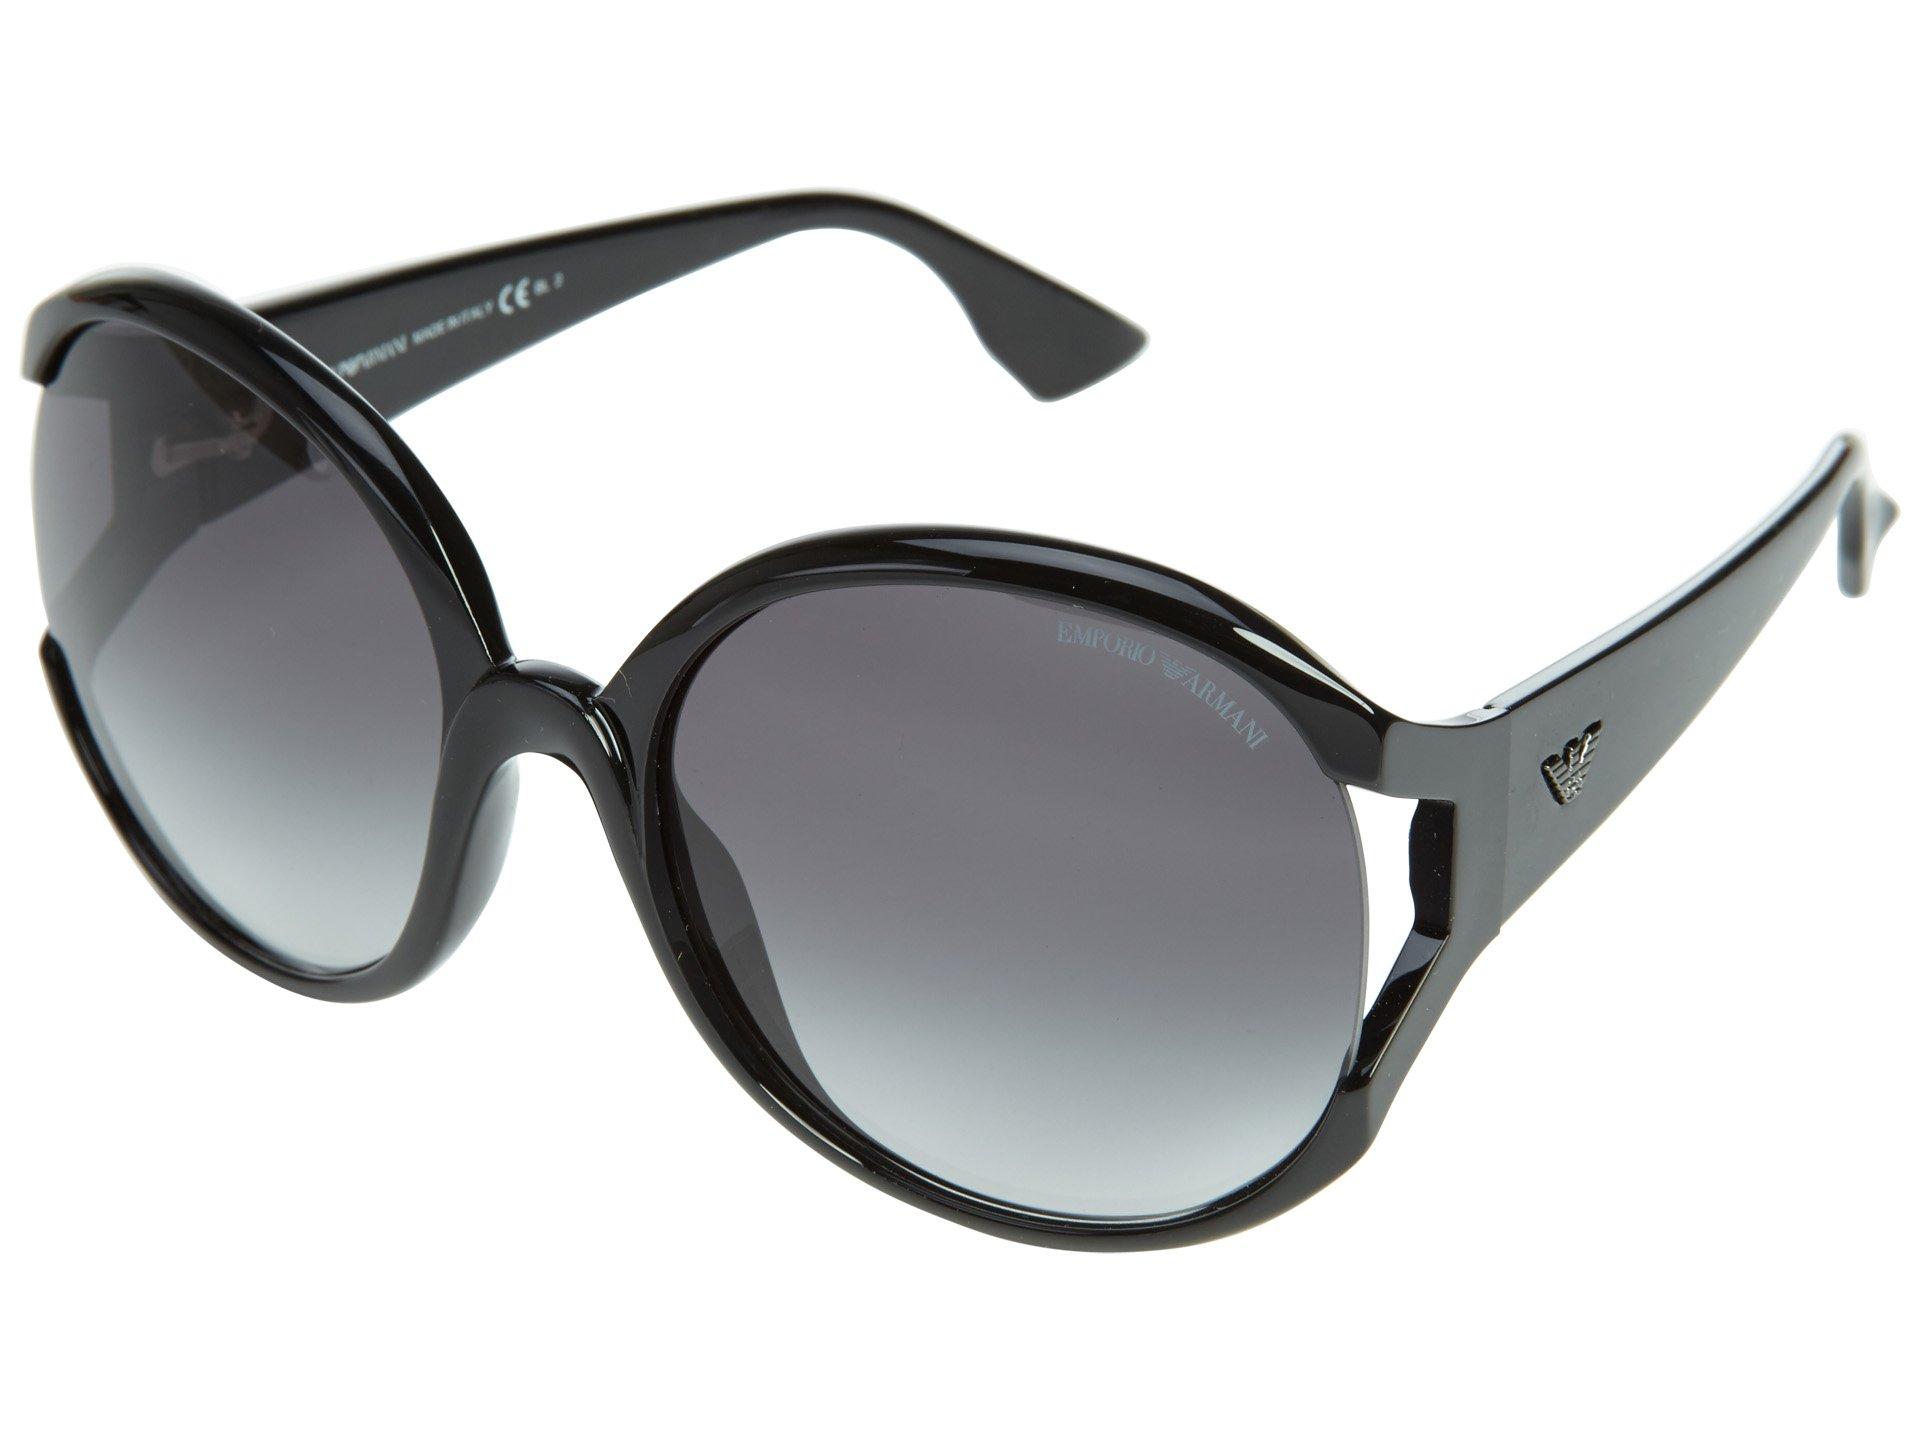 True Religion Sun Glasses Style: EA9706/S-59/125-D28 Size: OS by True Religion